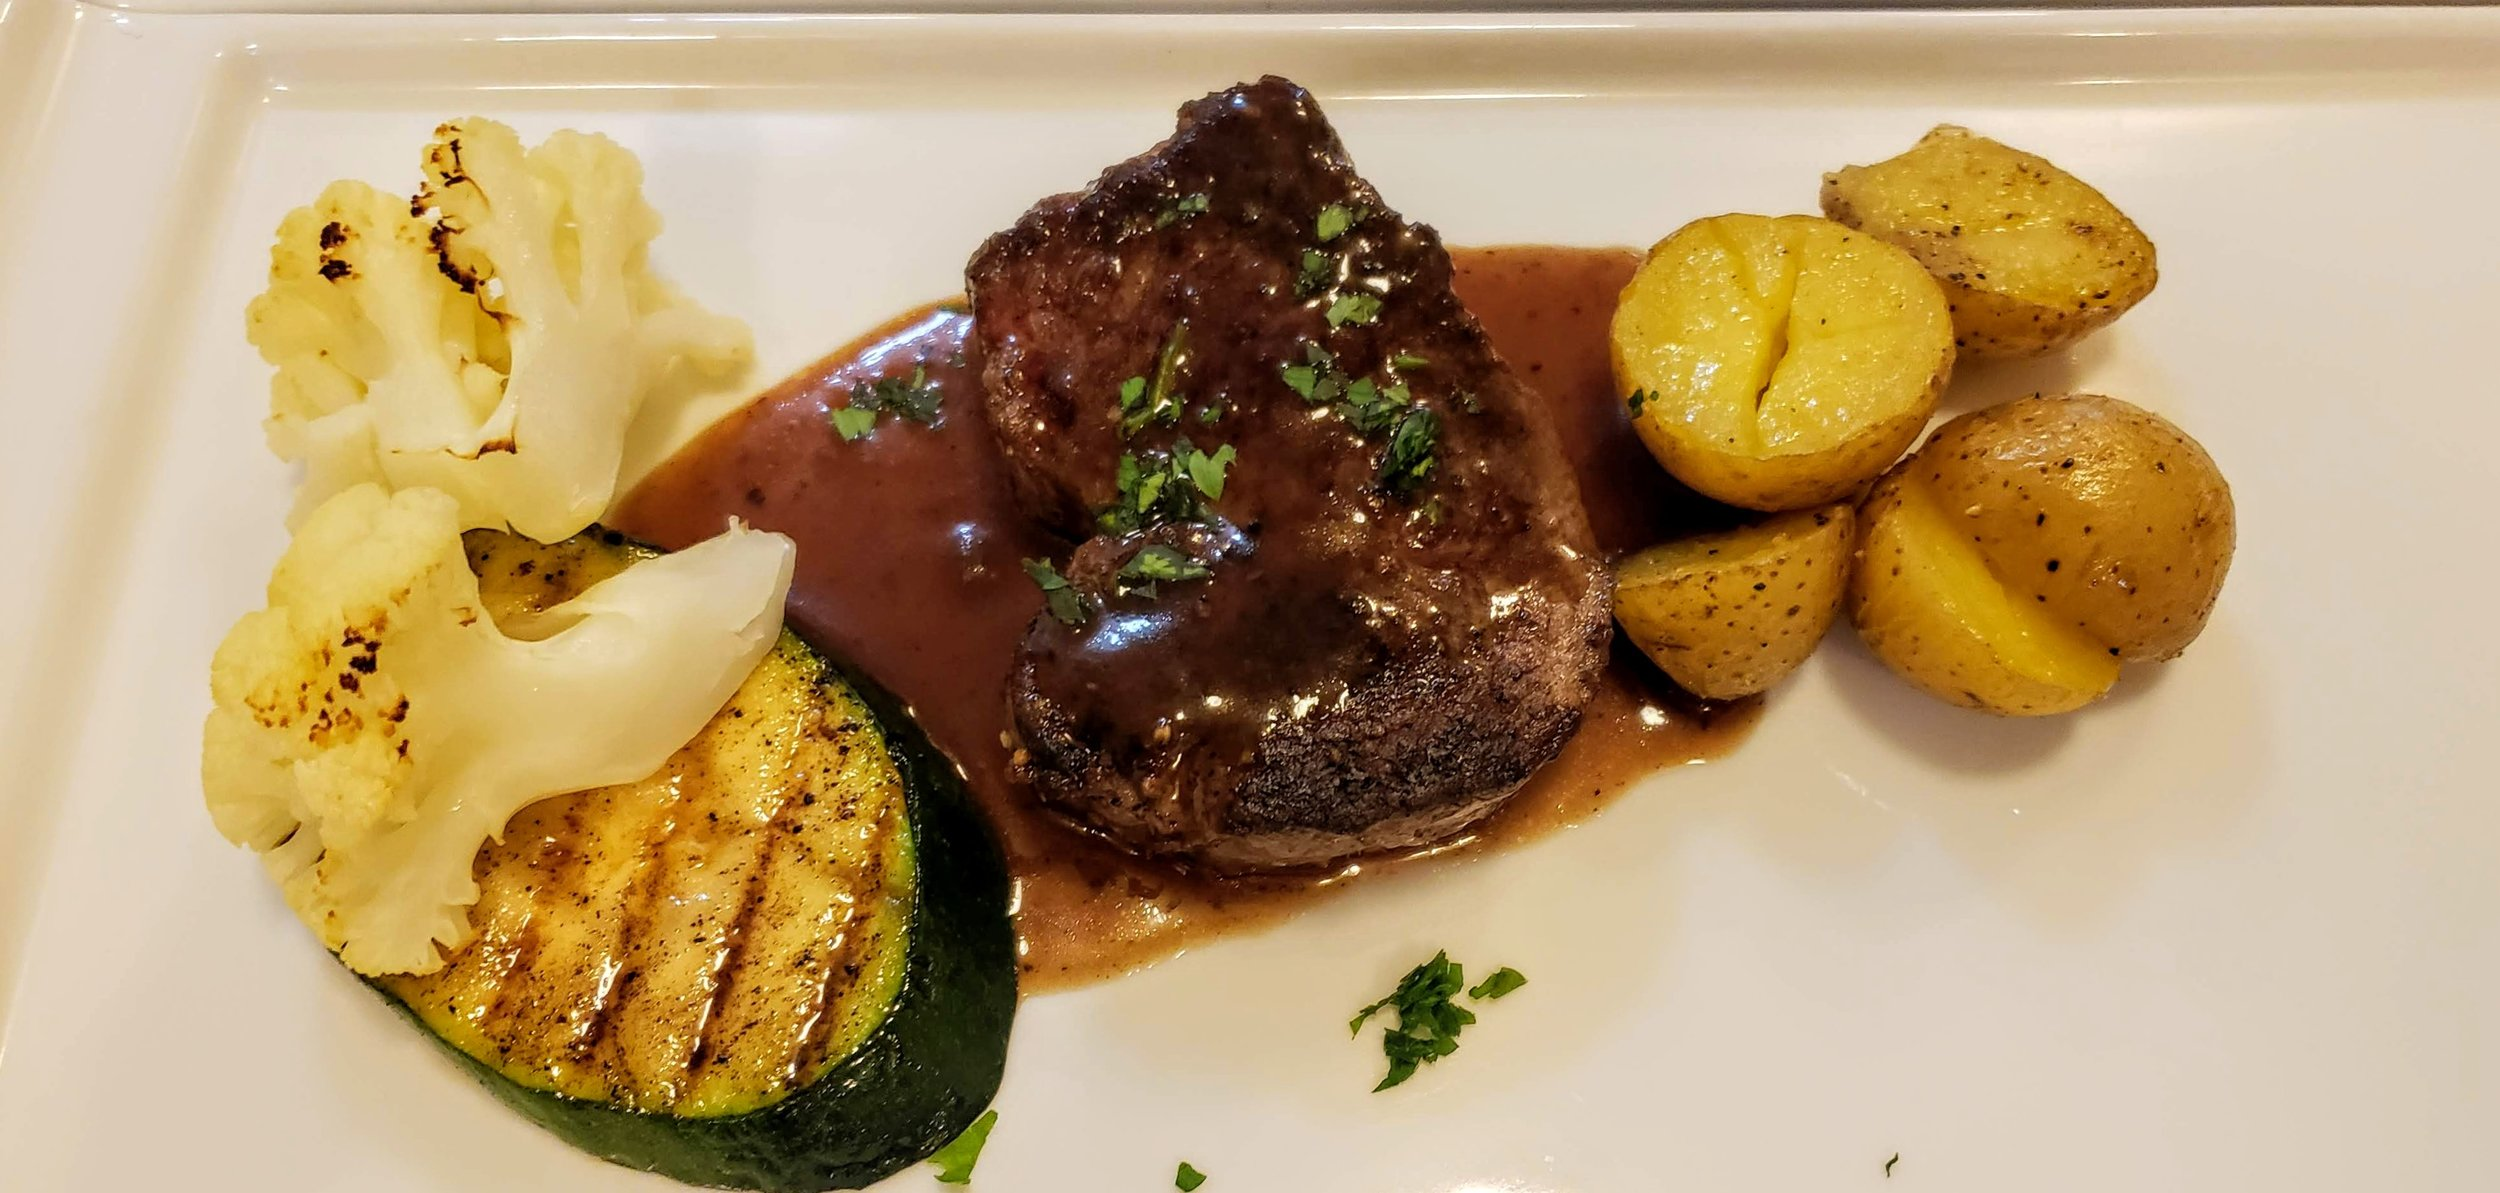 Pan Roasted Beef Tenderloin  Roasted Fingerling Potato, Seasonal Vegetables, Red Wine Demi